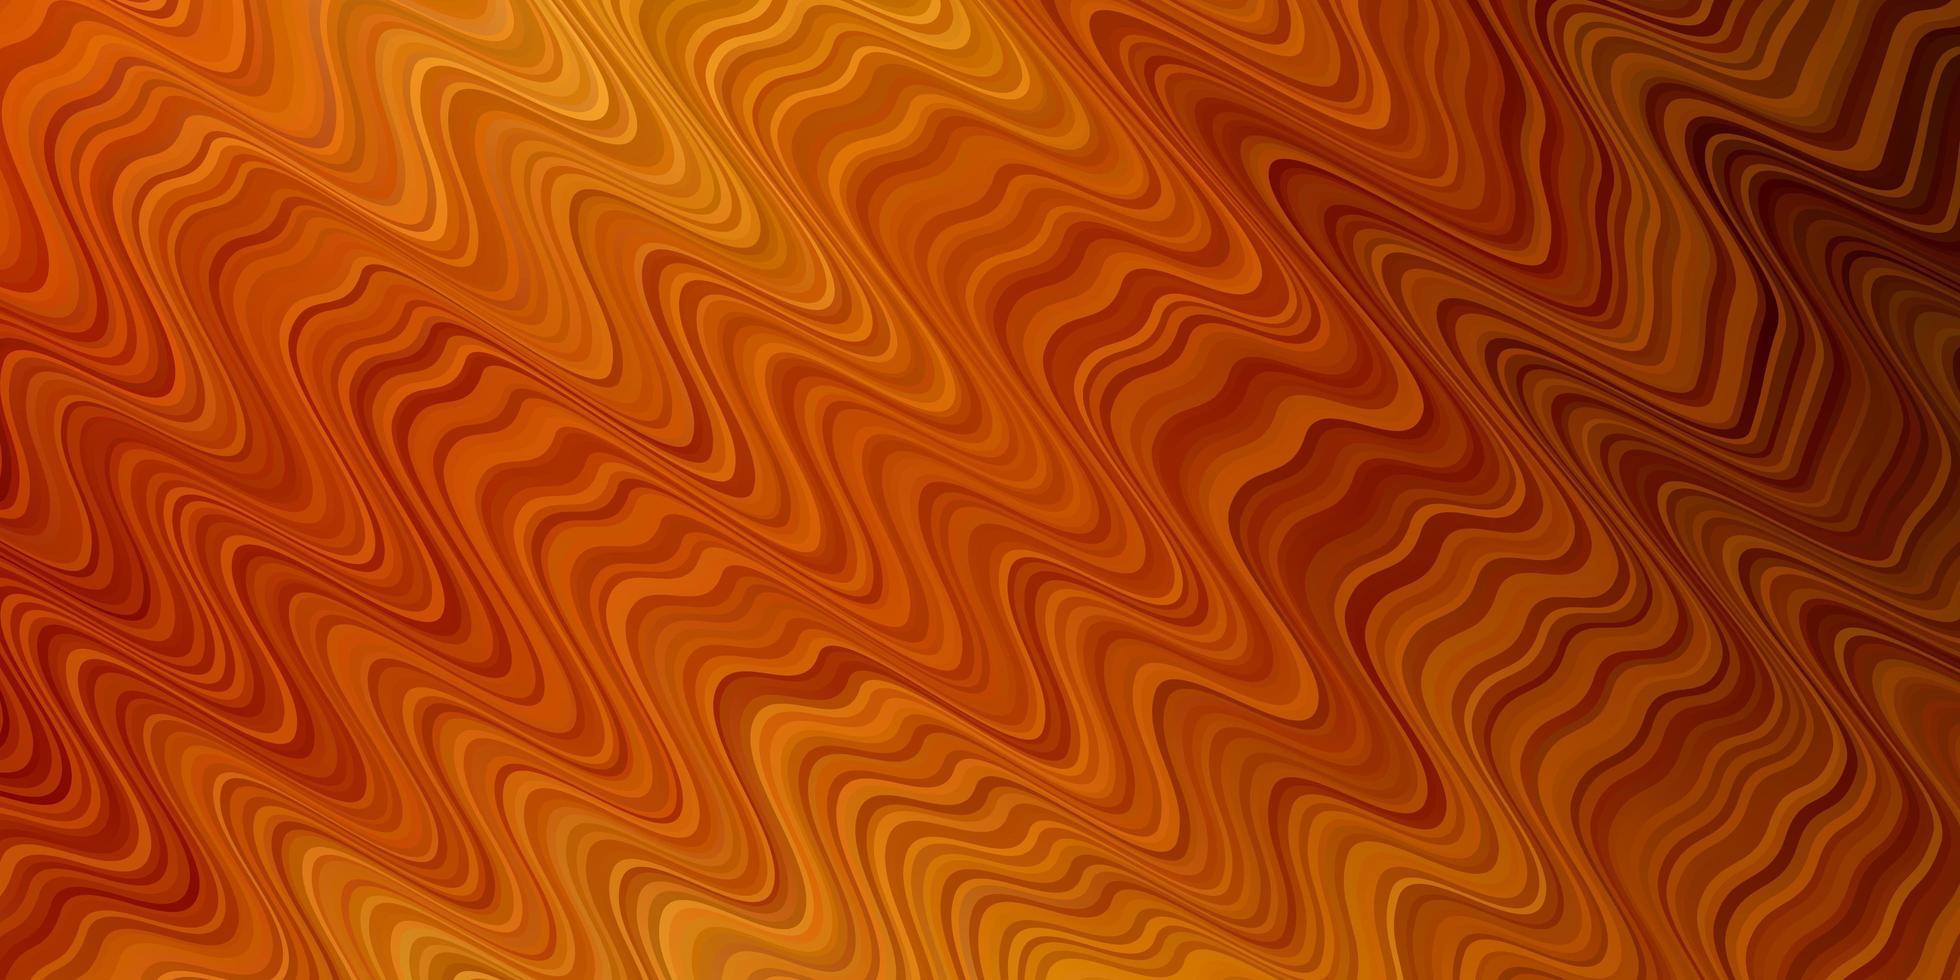 Fondo de vector naranja claro con líneas.